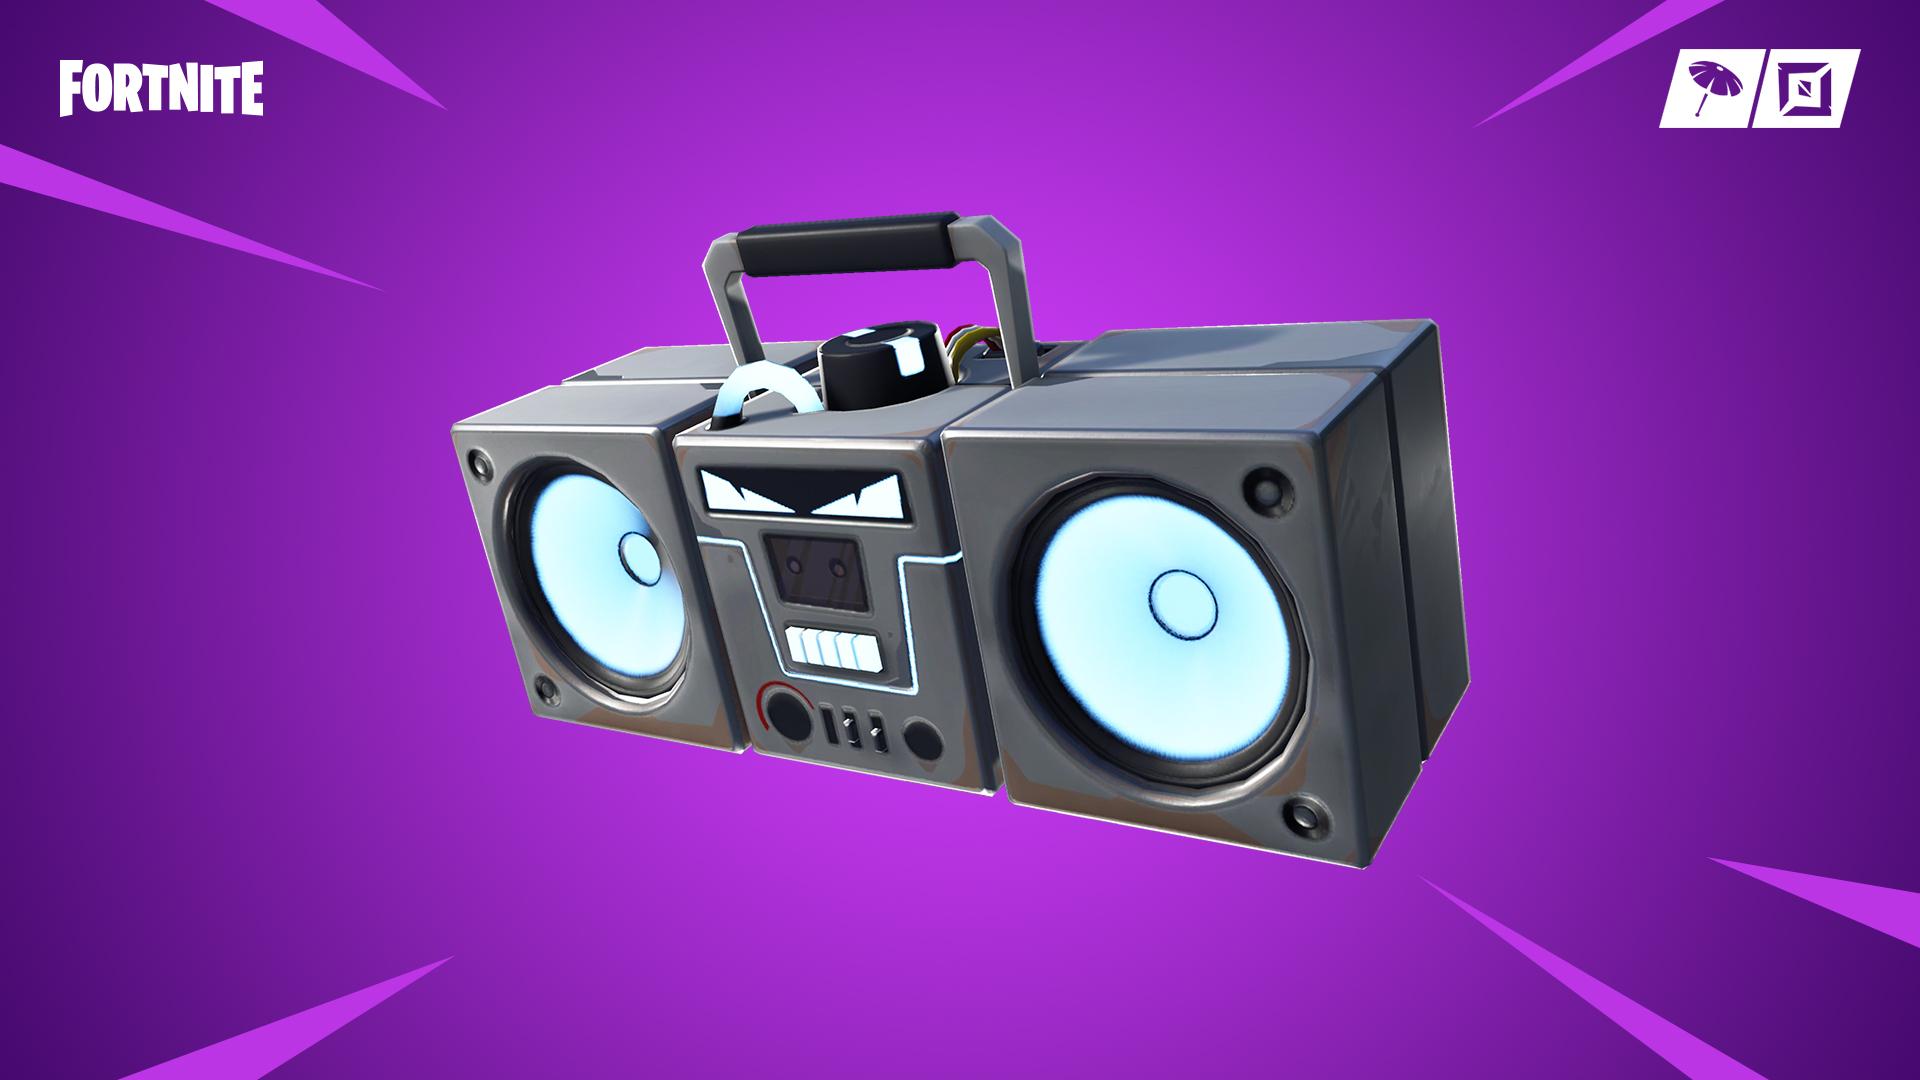 Fortnite Boom Box